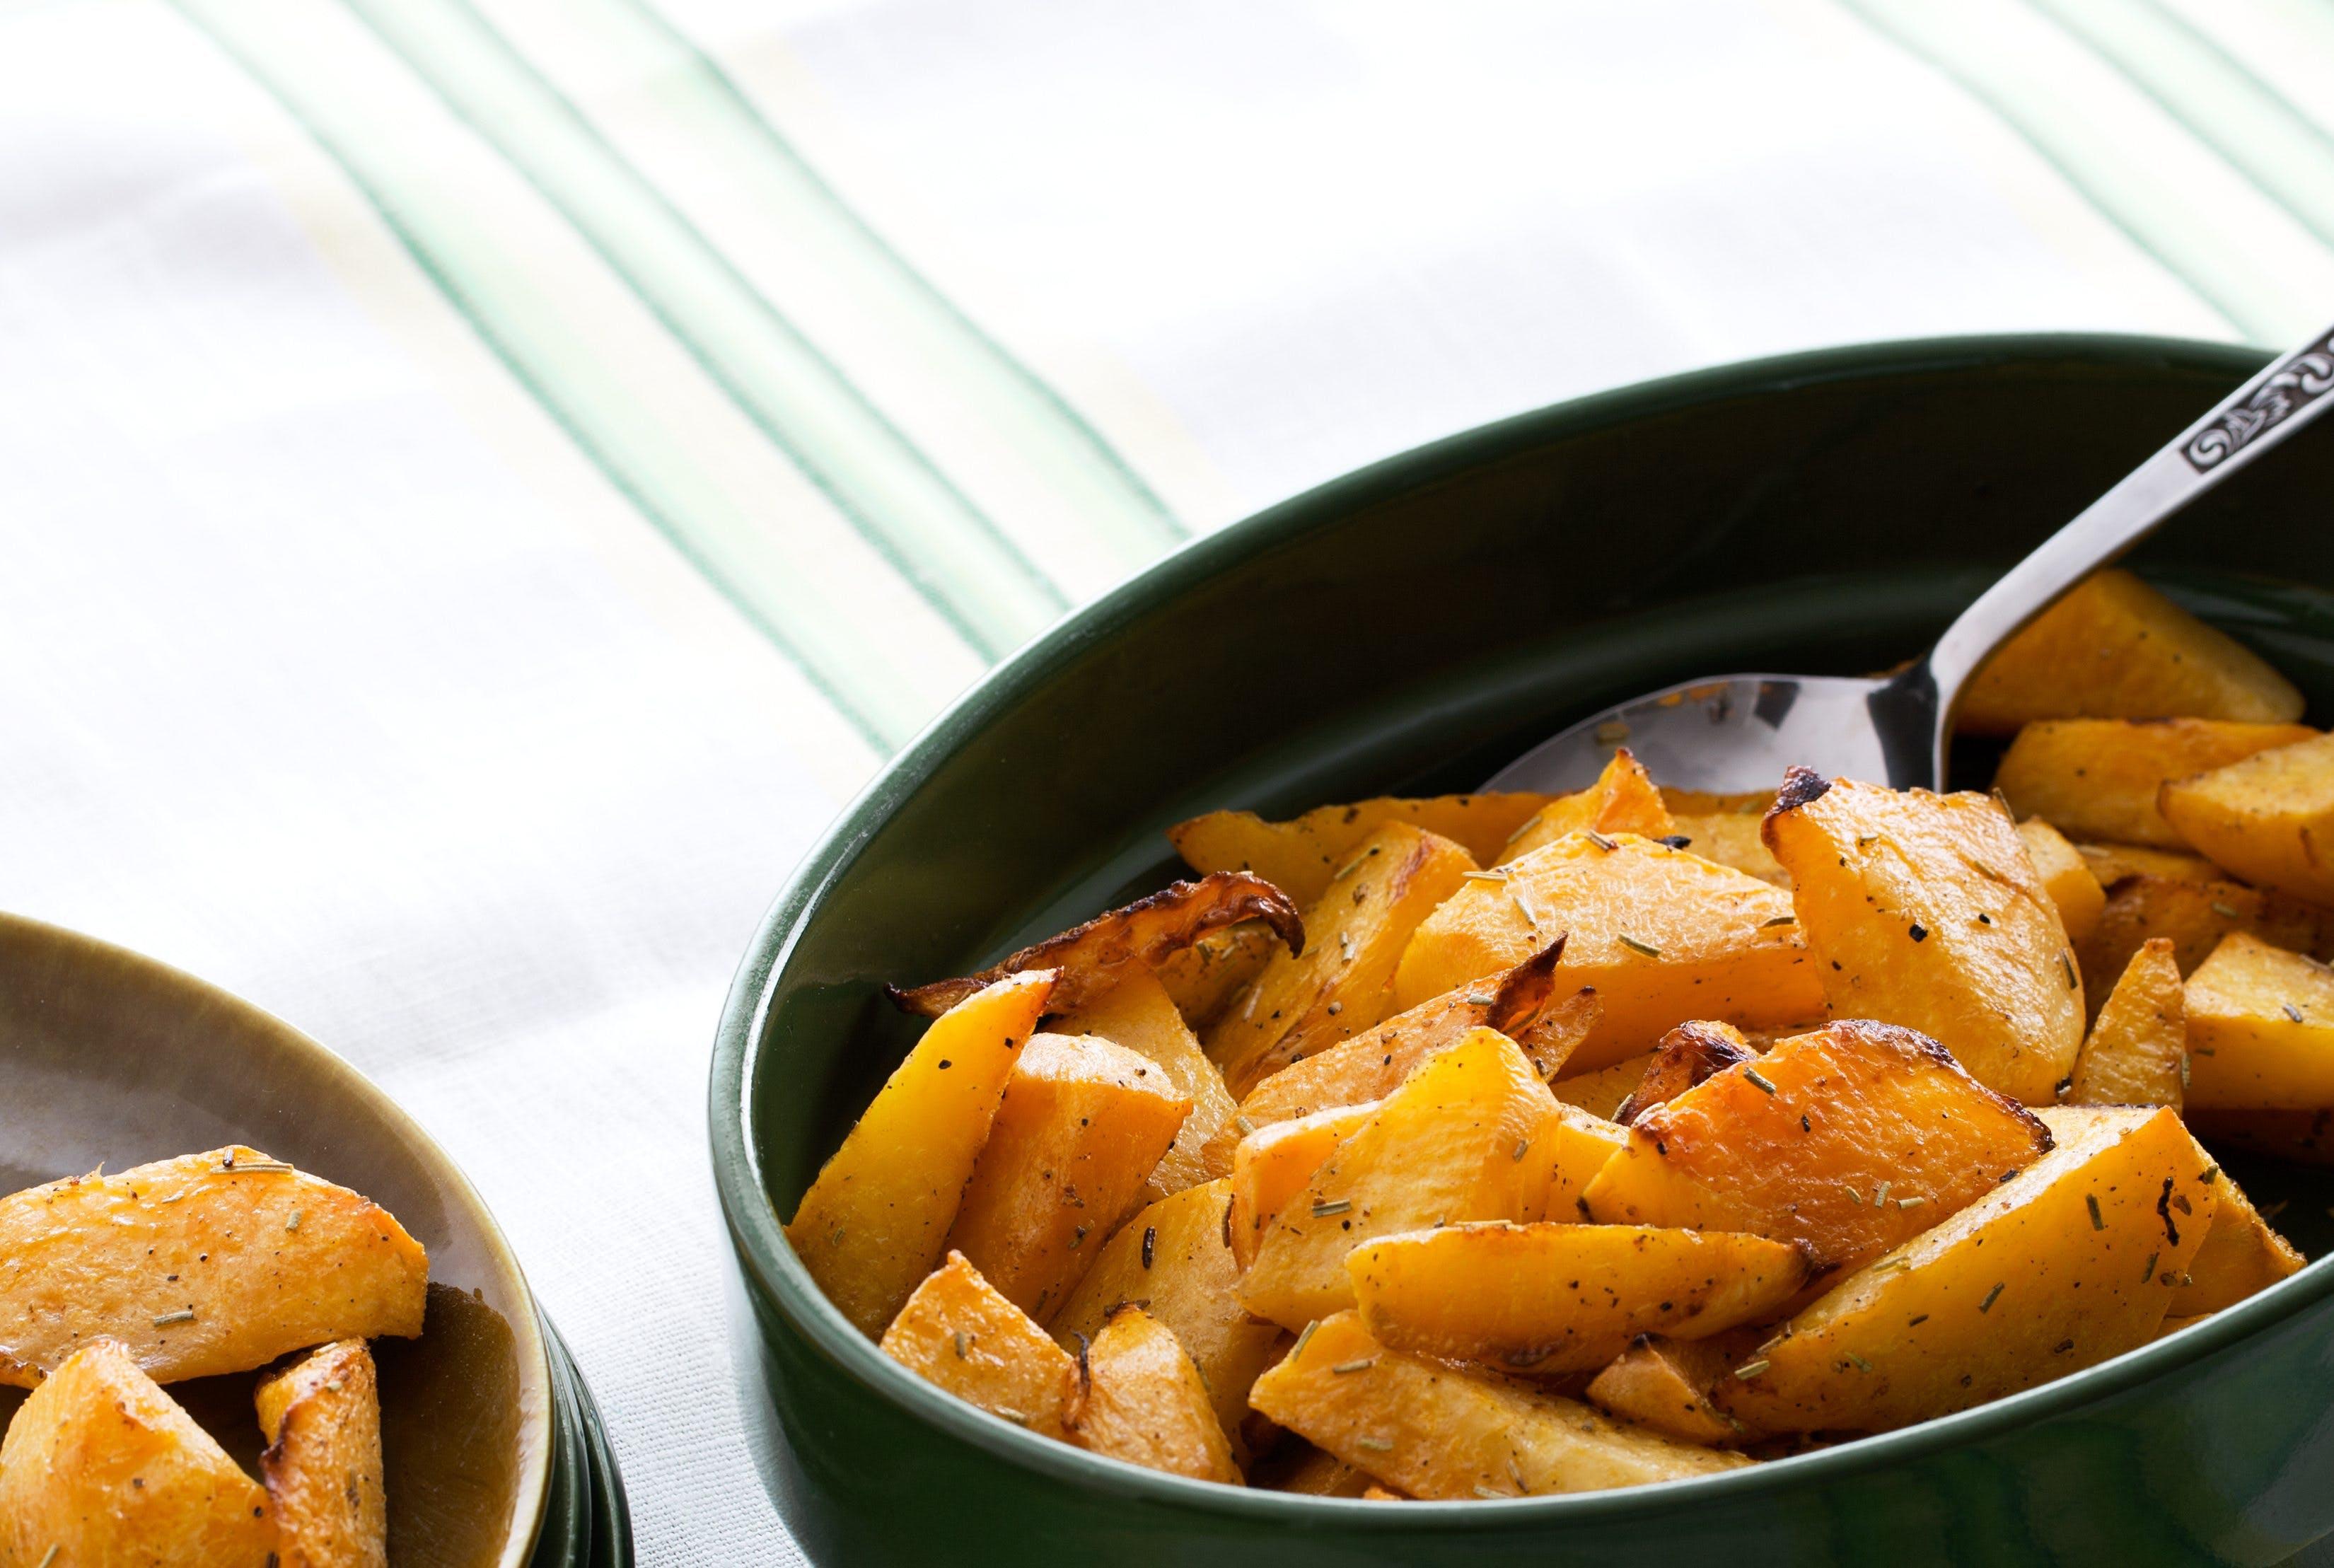 Oven-baked rutabaga wedges